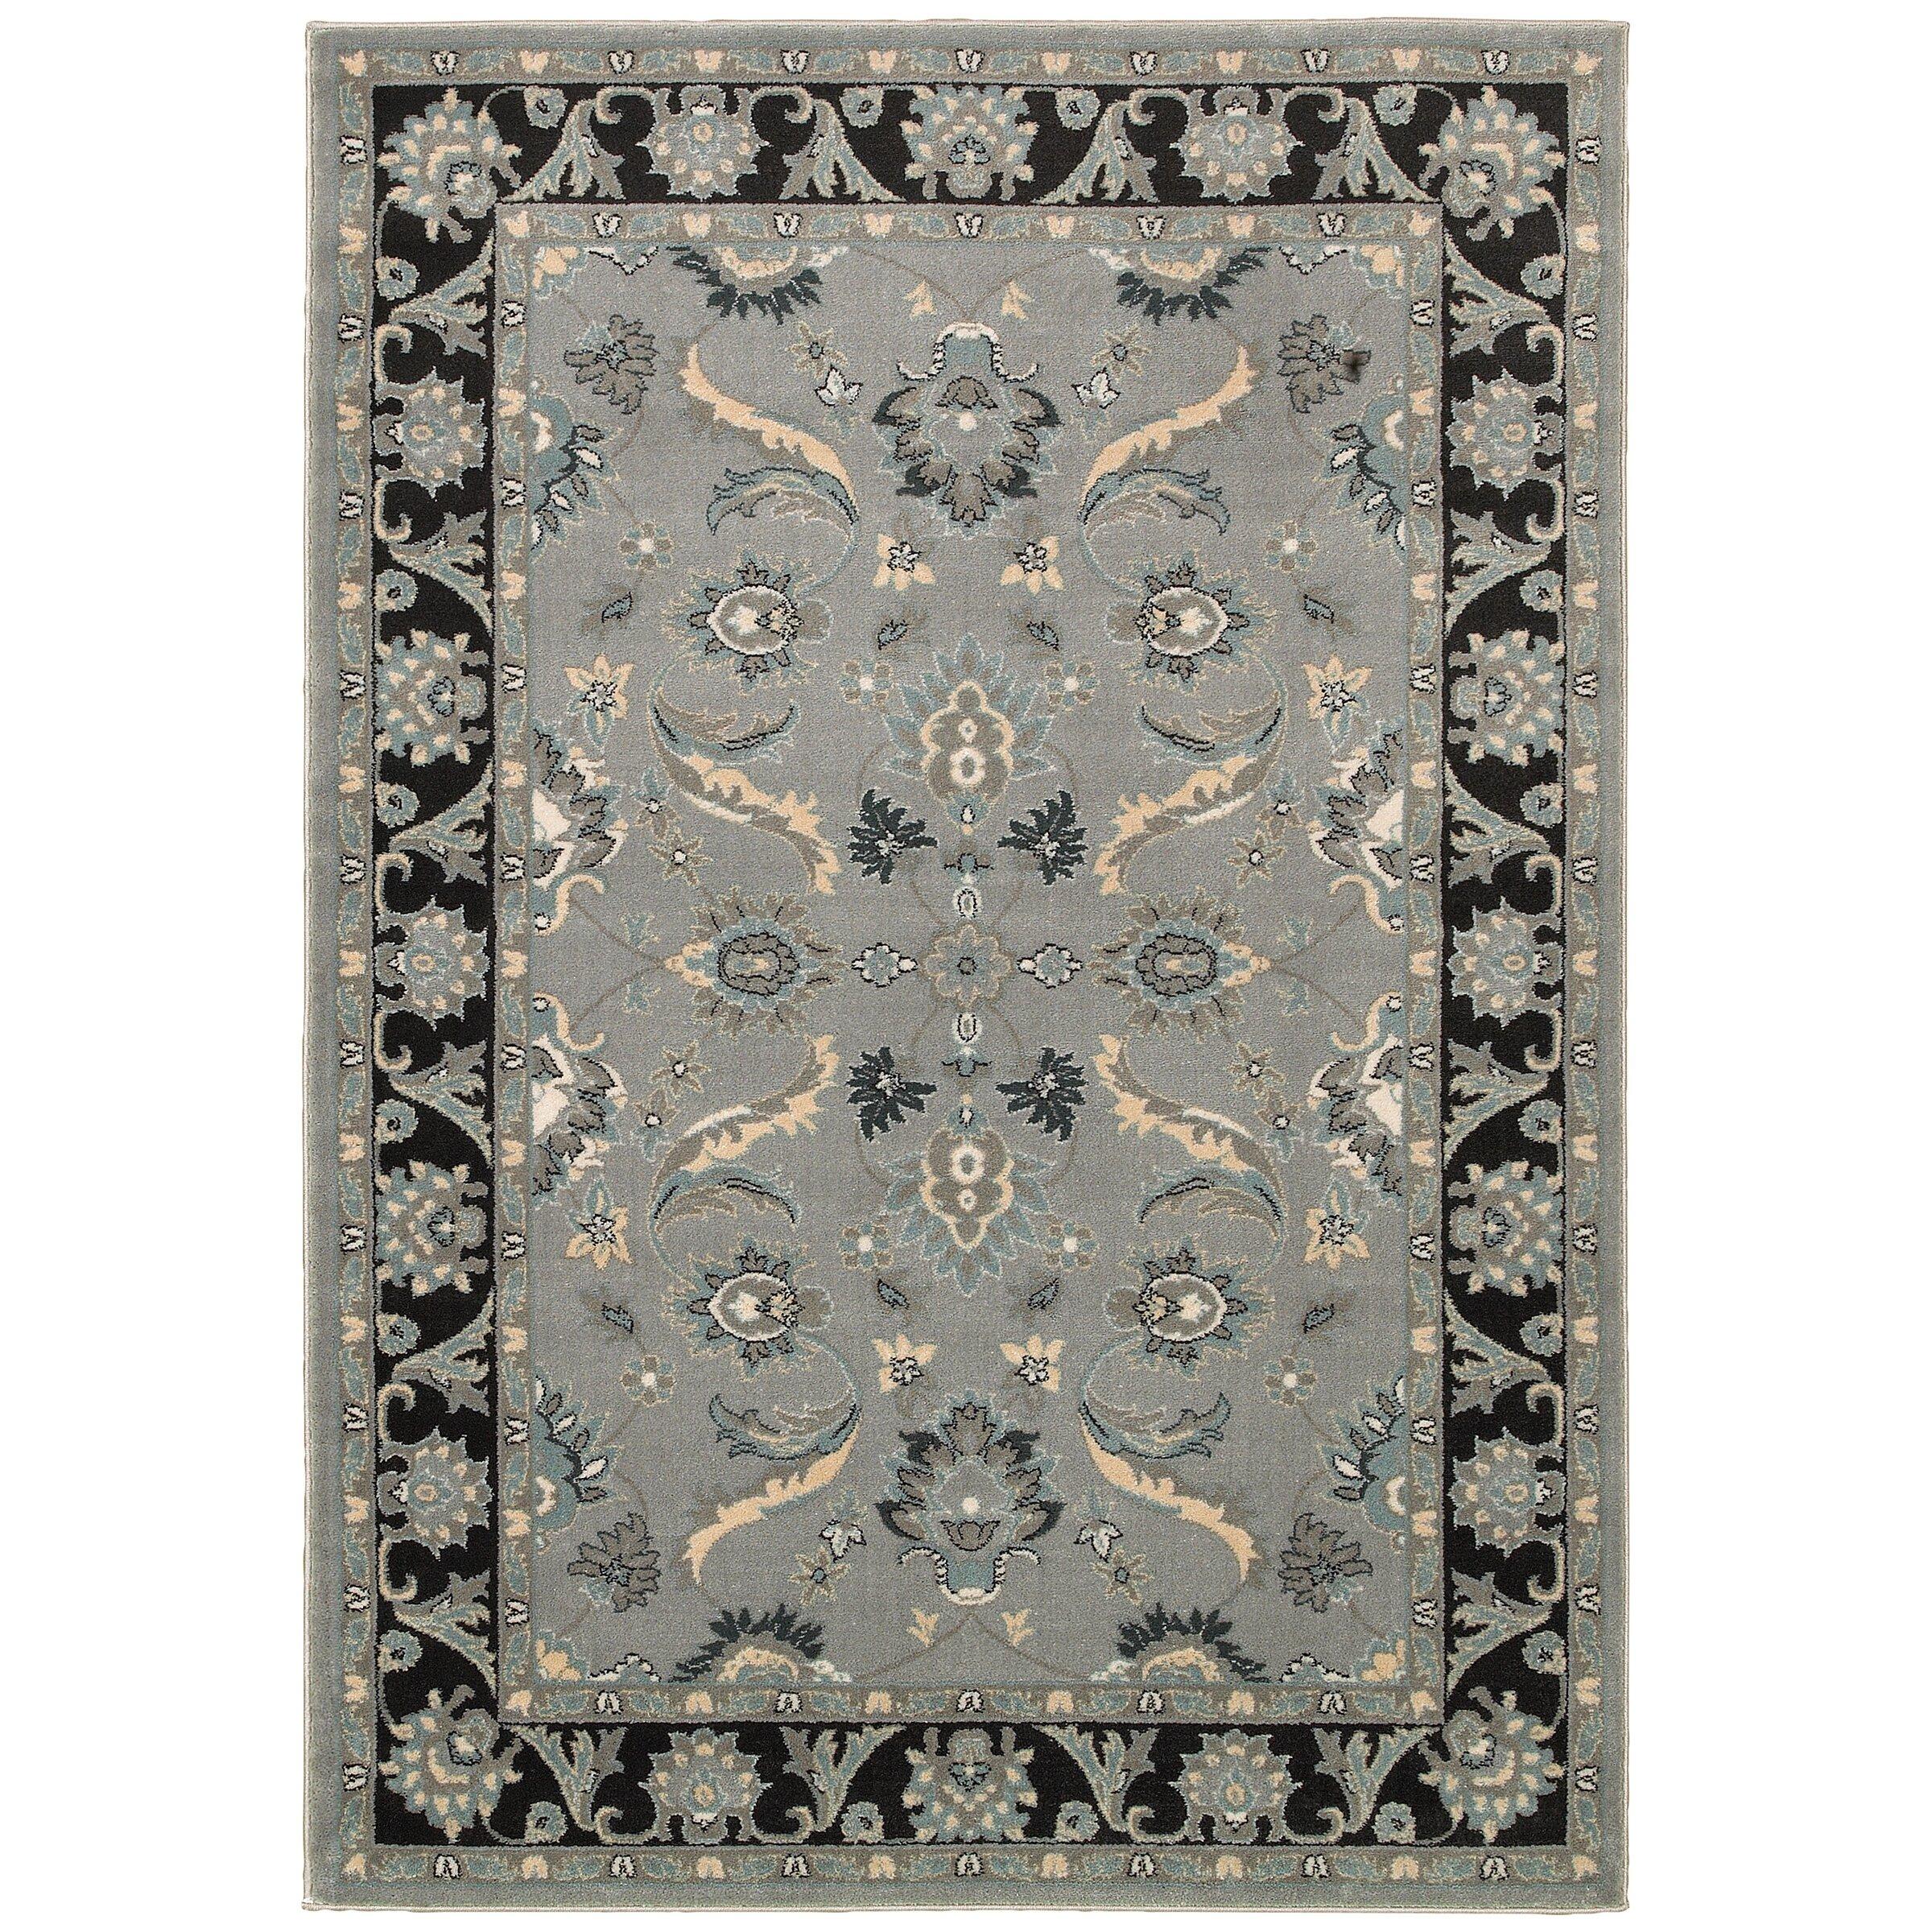 lr resources adana gray black area rug reviews wayfair. Black Bedroom Furniture Sets. Home Design Ideas